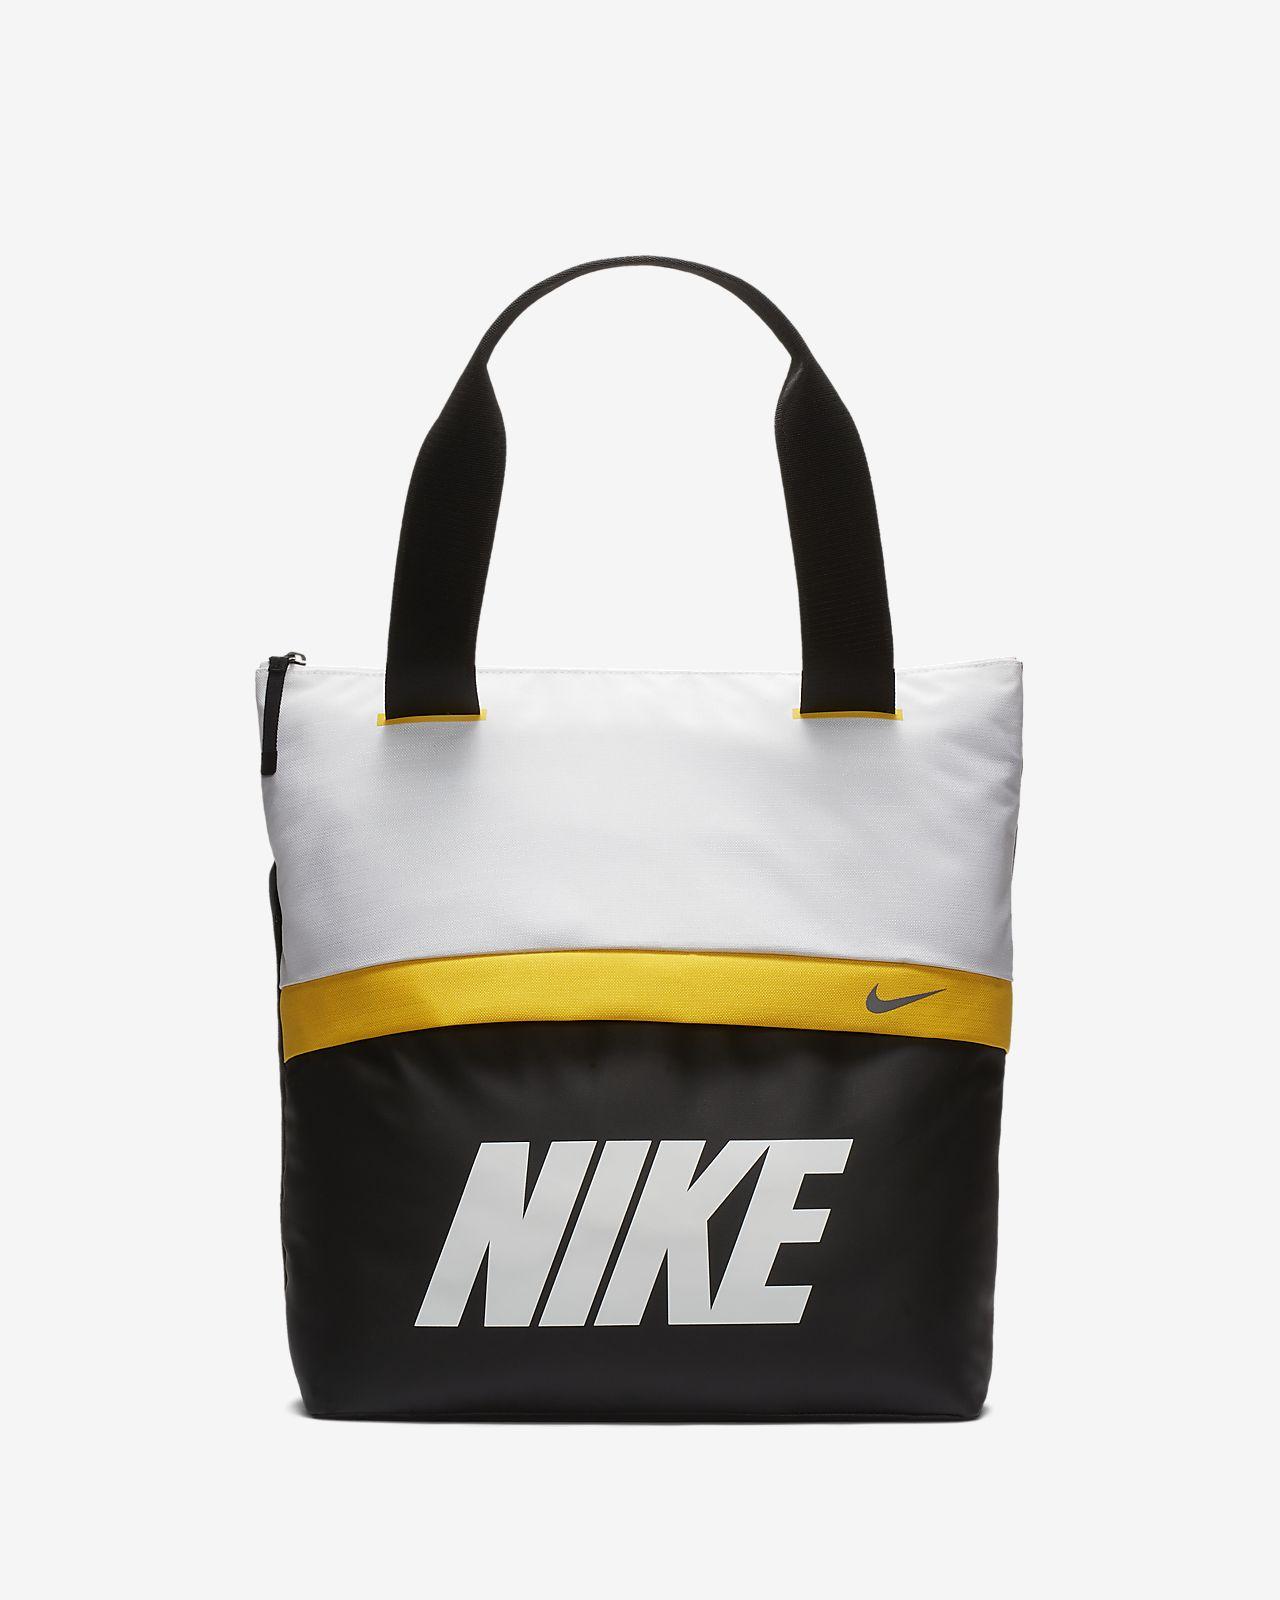 b22cf5947c1d Nike Radiate Women s Training Graphic Tote Bag. Nike.com ID